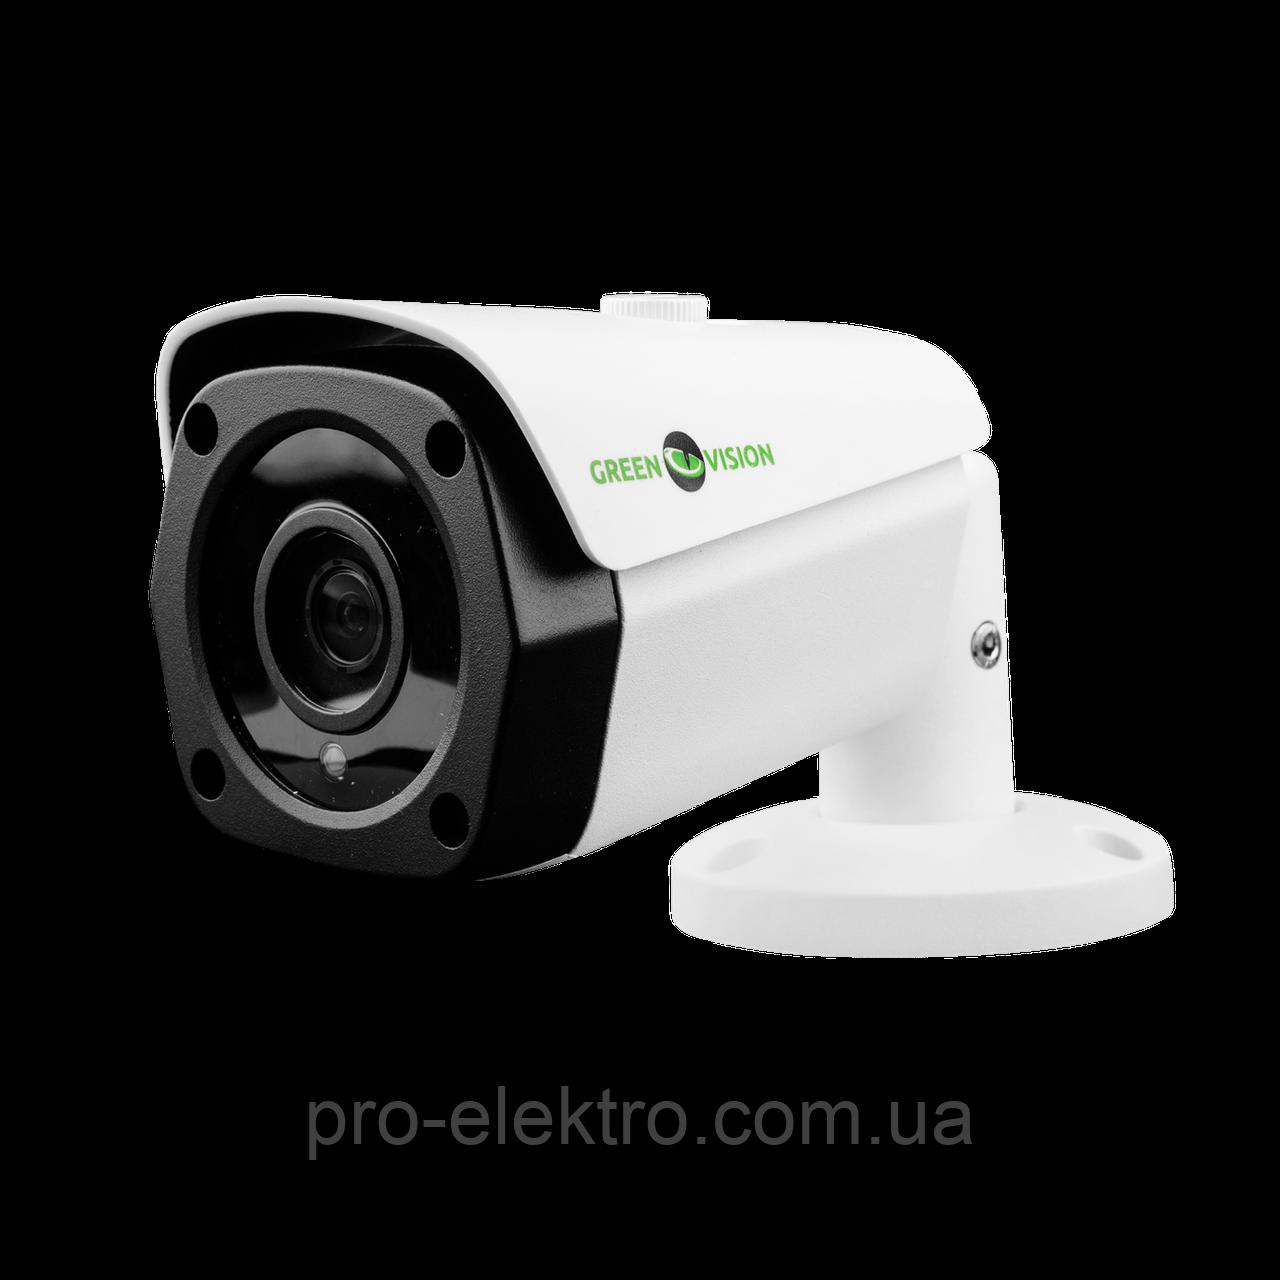 IP камера зовнішня GreenVision GV-078-IP-E-COF20-20